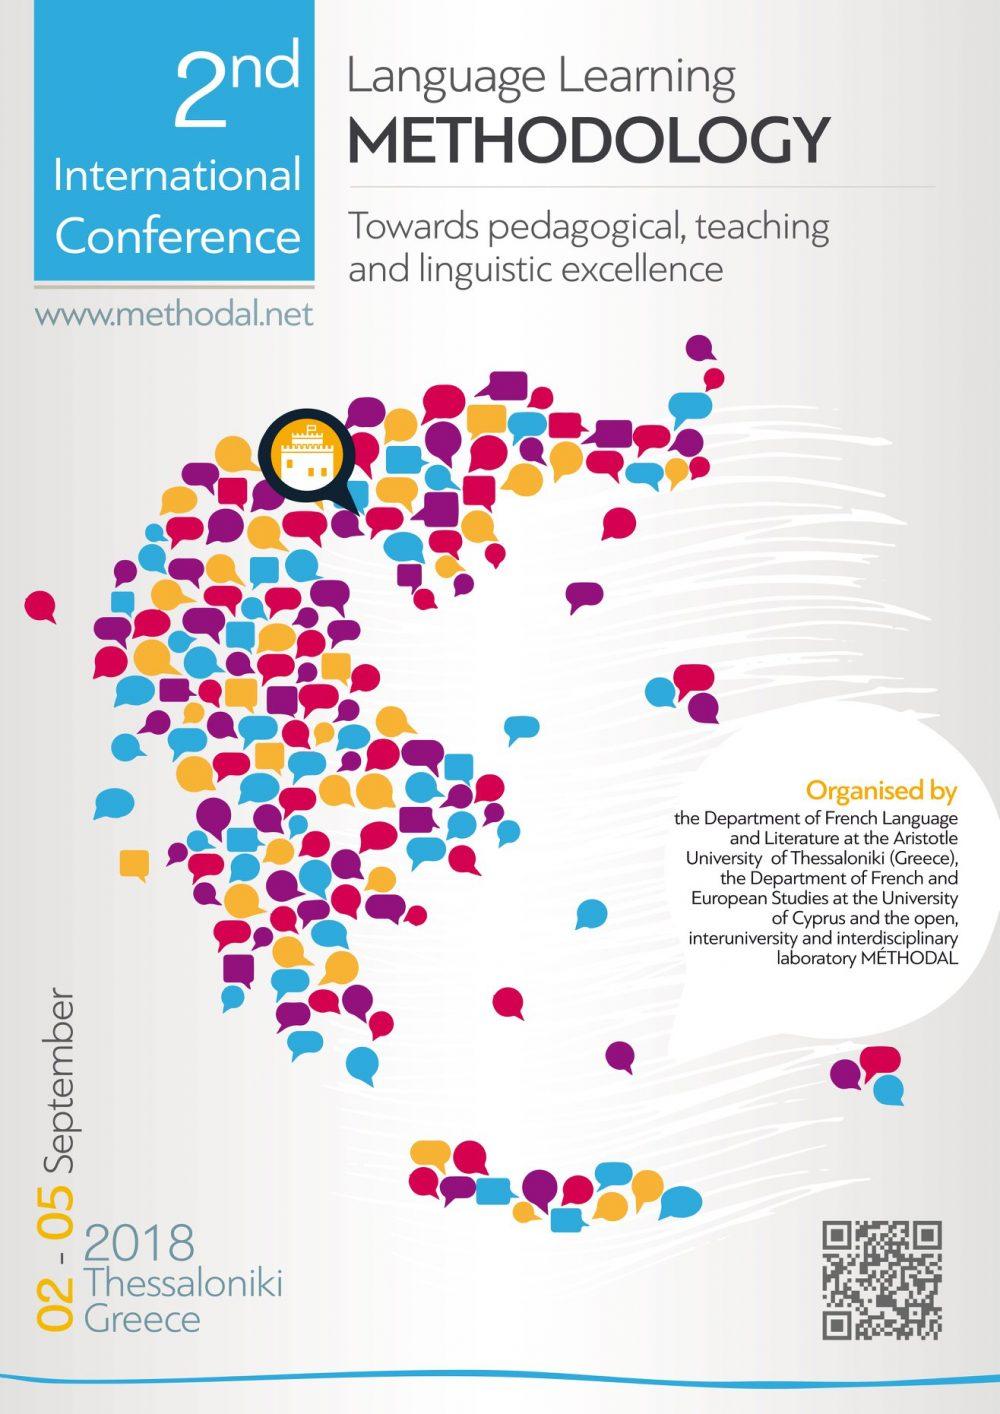 2nd International Conference of Language Learning Methodology